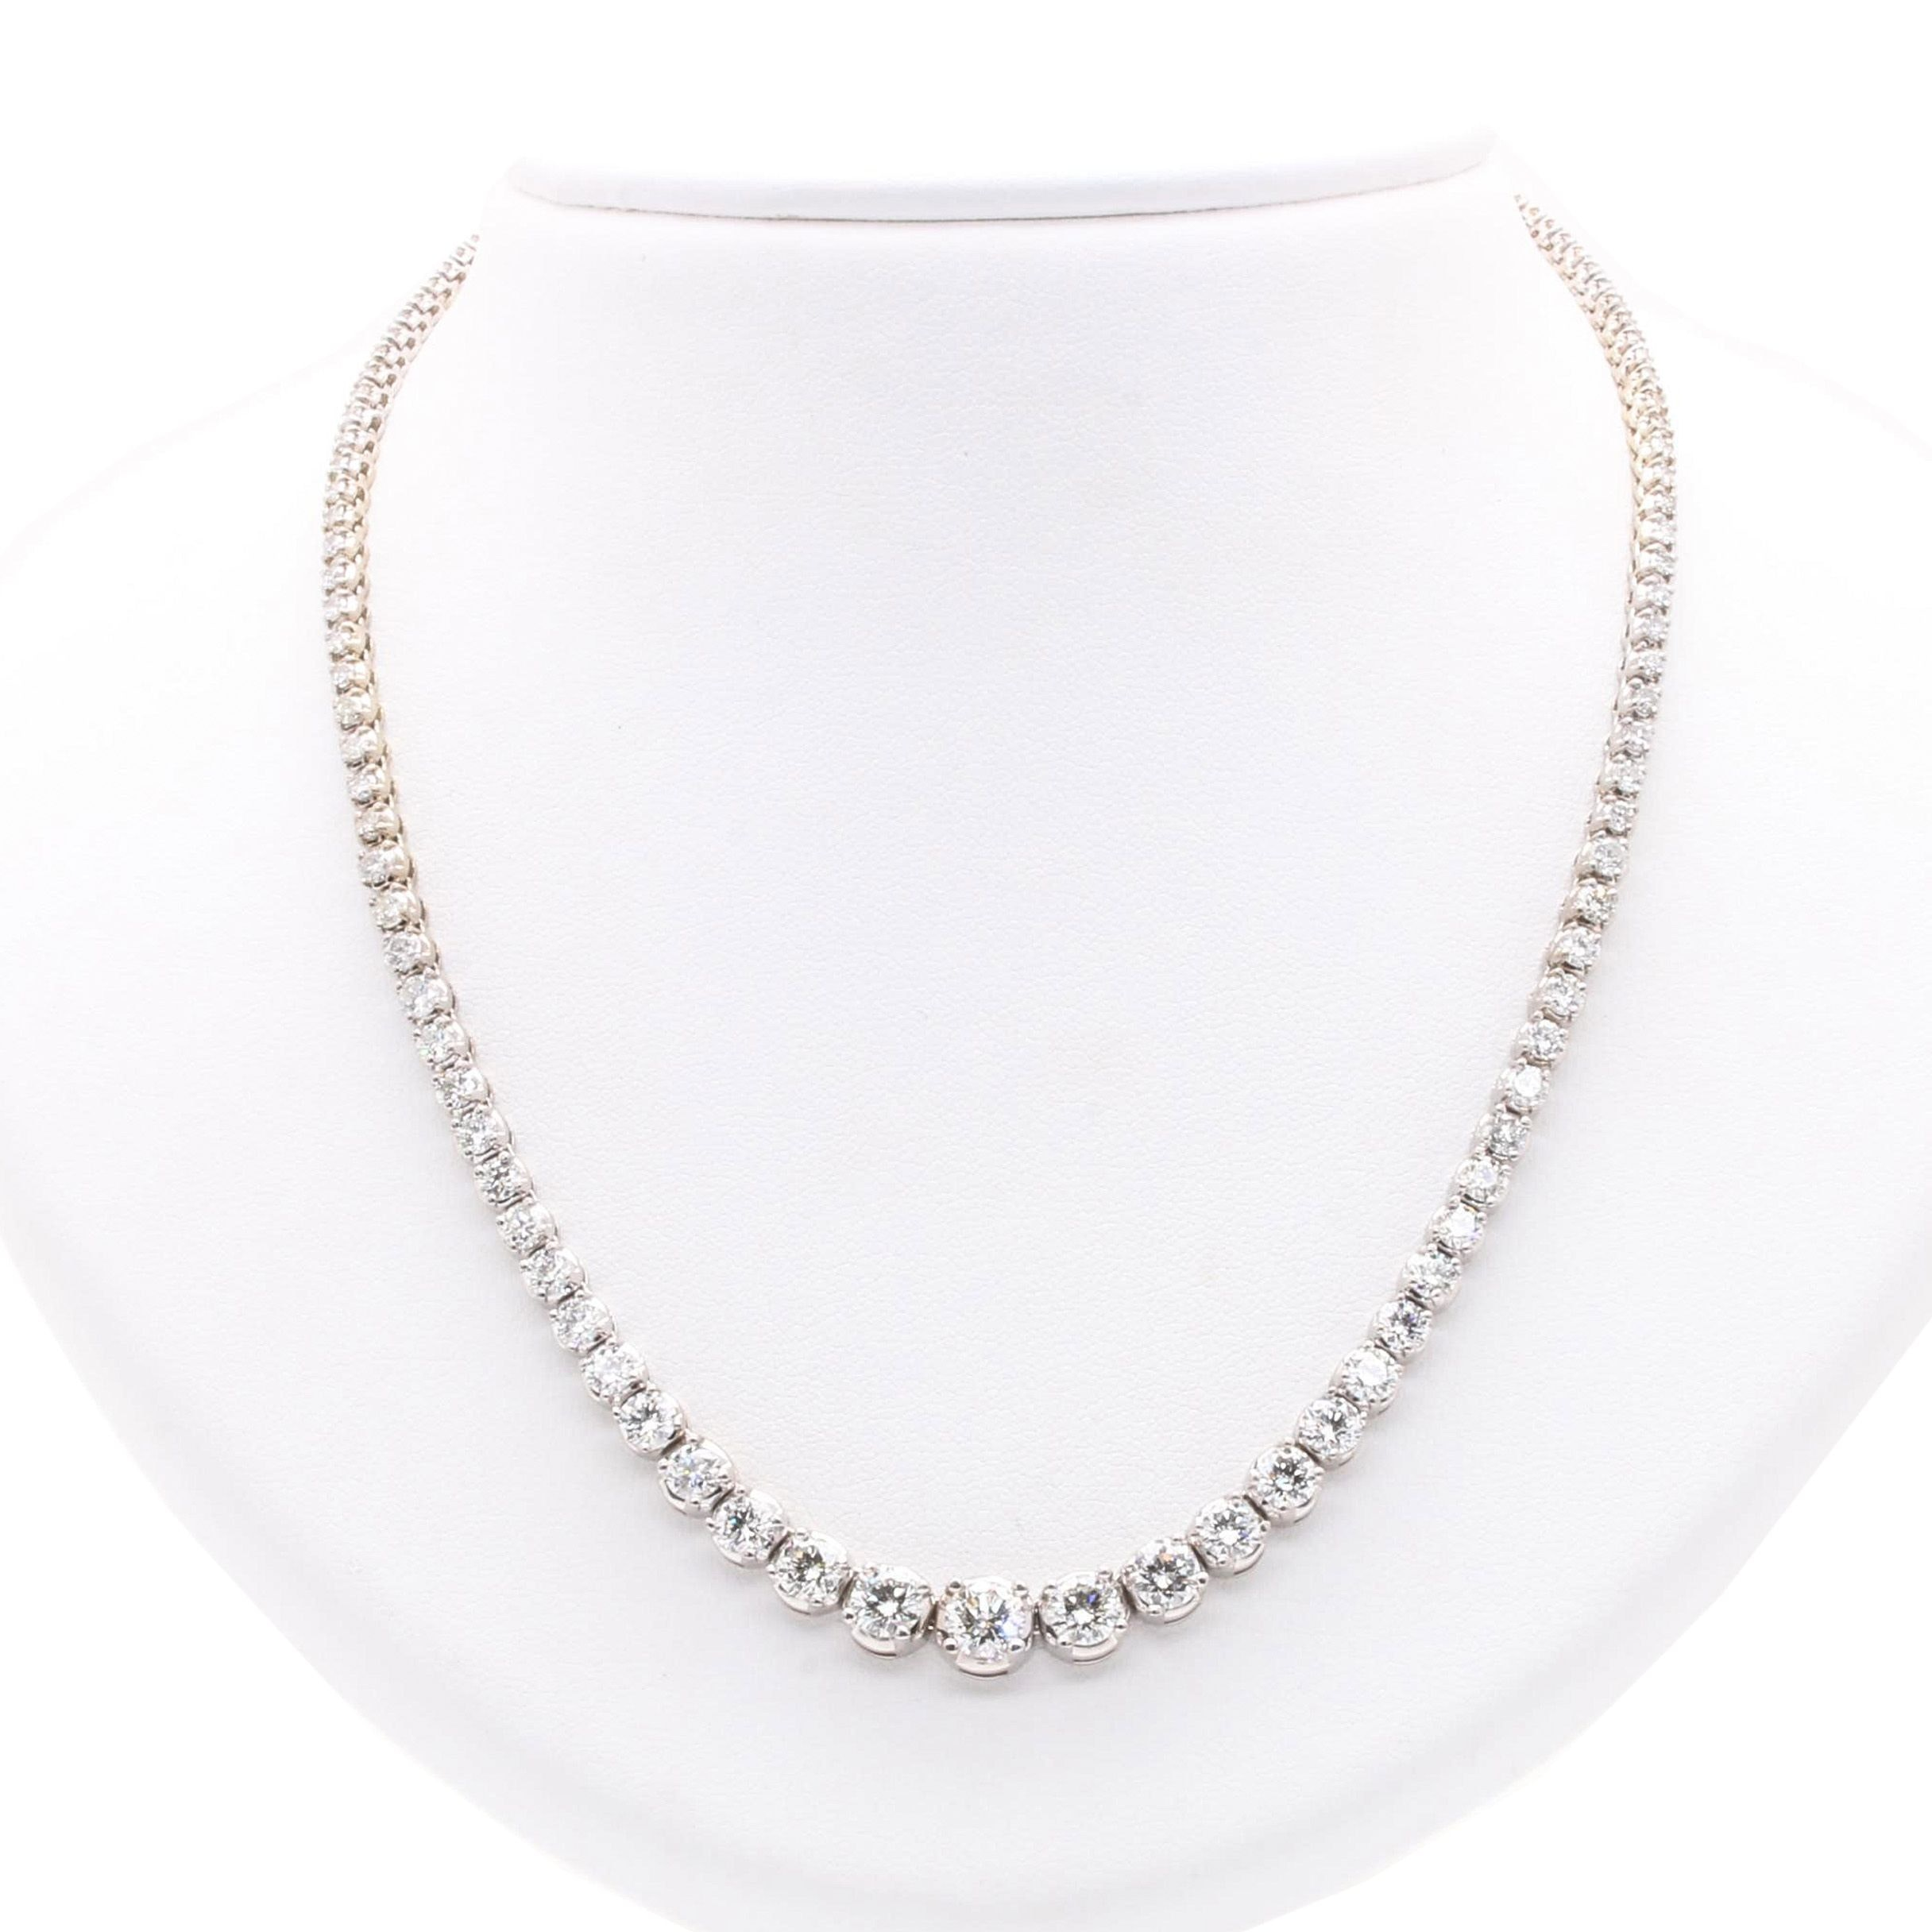 14K White Gold 10.78 CTW Diamond Necklace